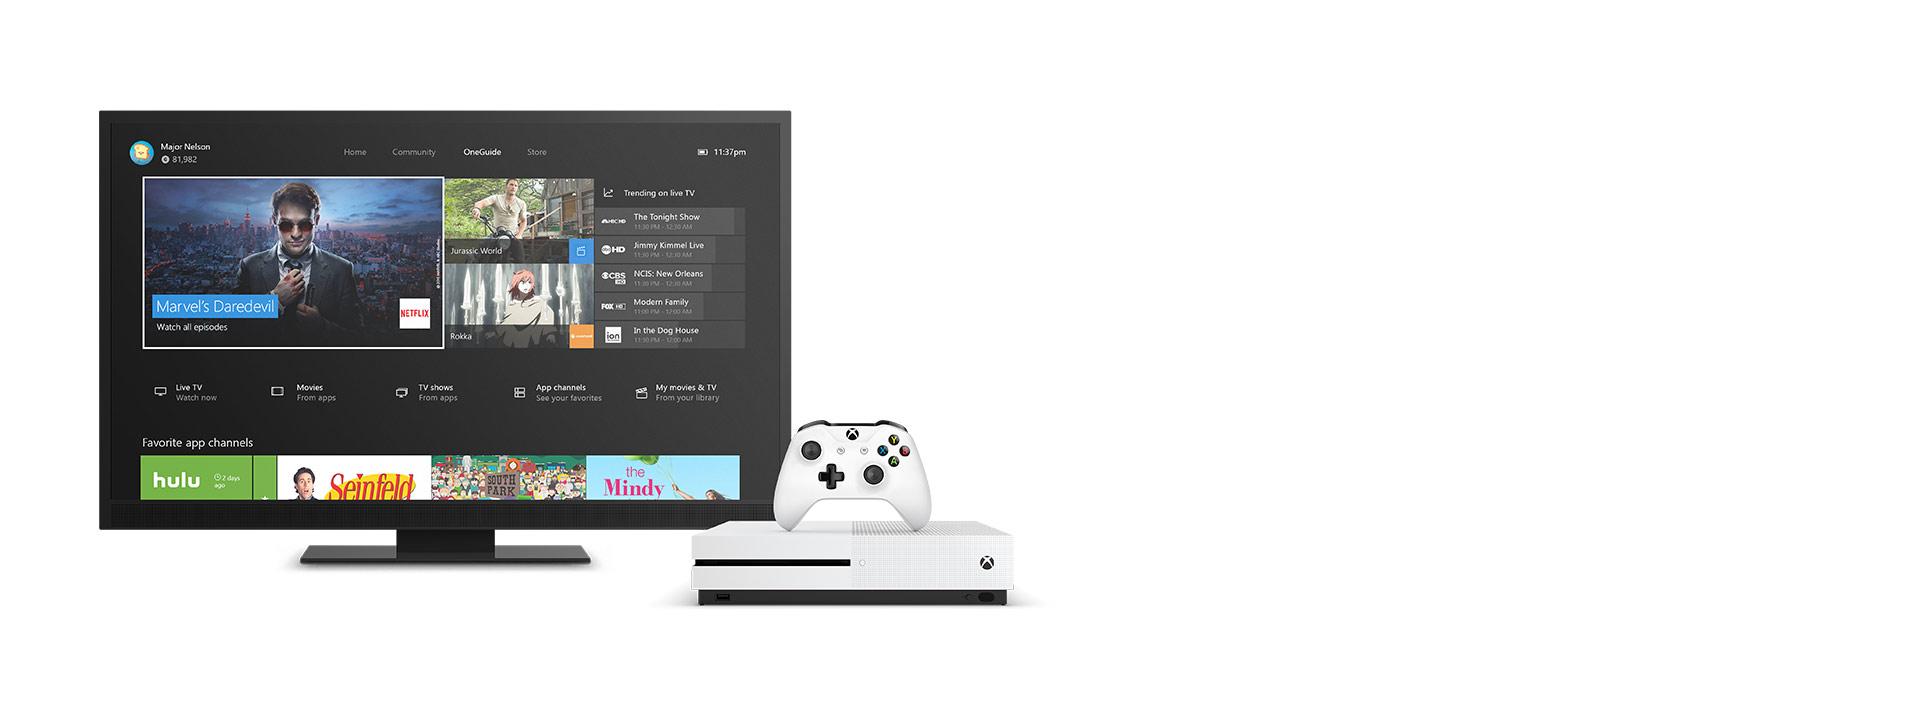 Xbox One S 엔터테인먼트